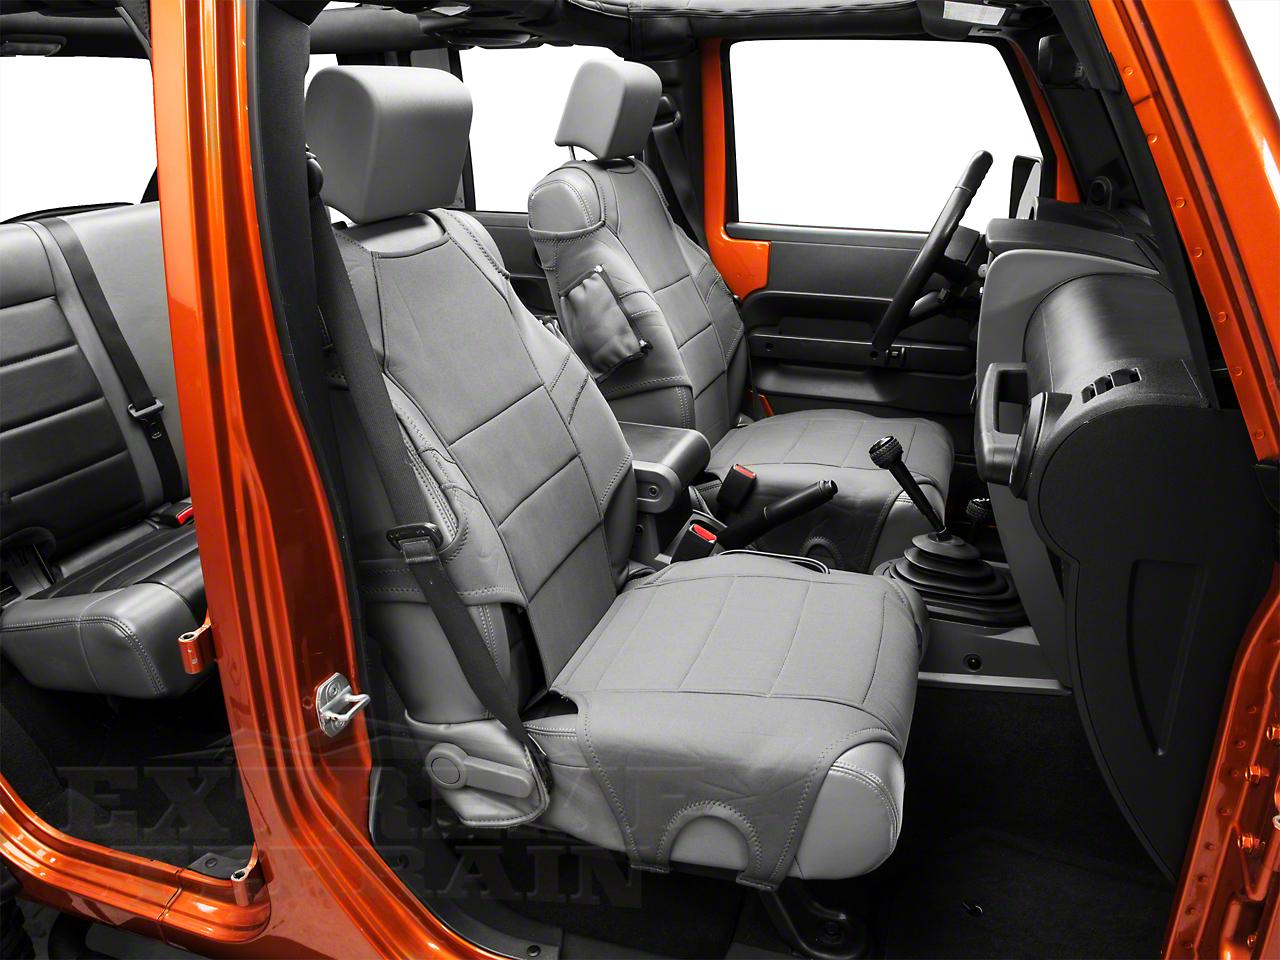 Rugged Ridge Neoprene Front Seat Protectors - Charcoal Gray (07-18 Jeep Wrangler JK; 2018 Jeep Wrangler JL)